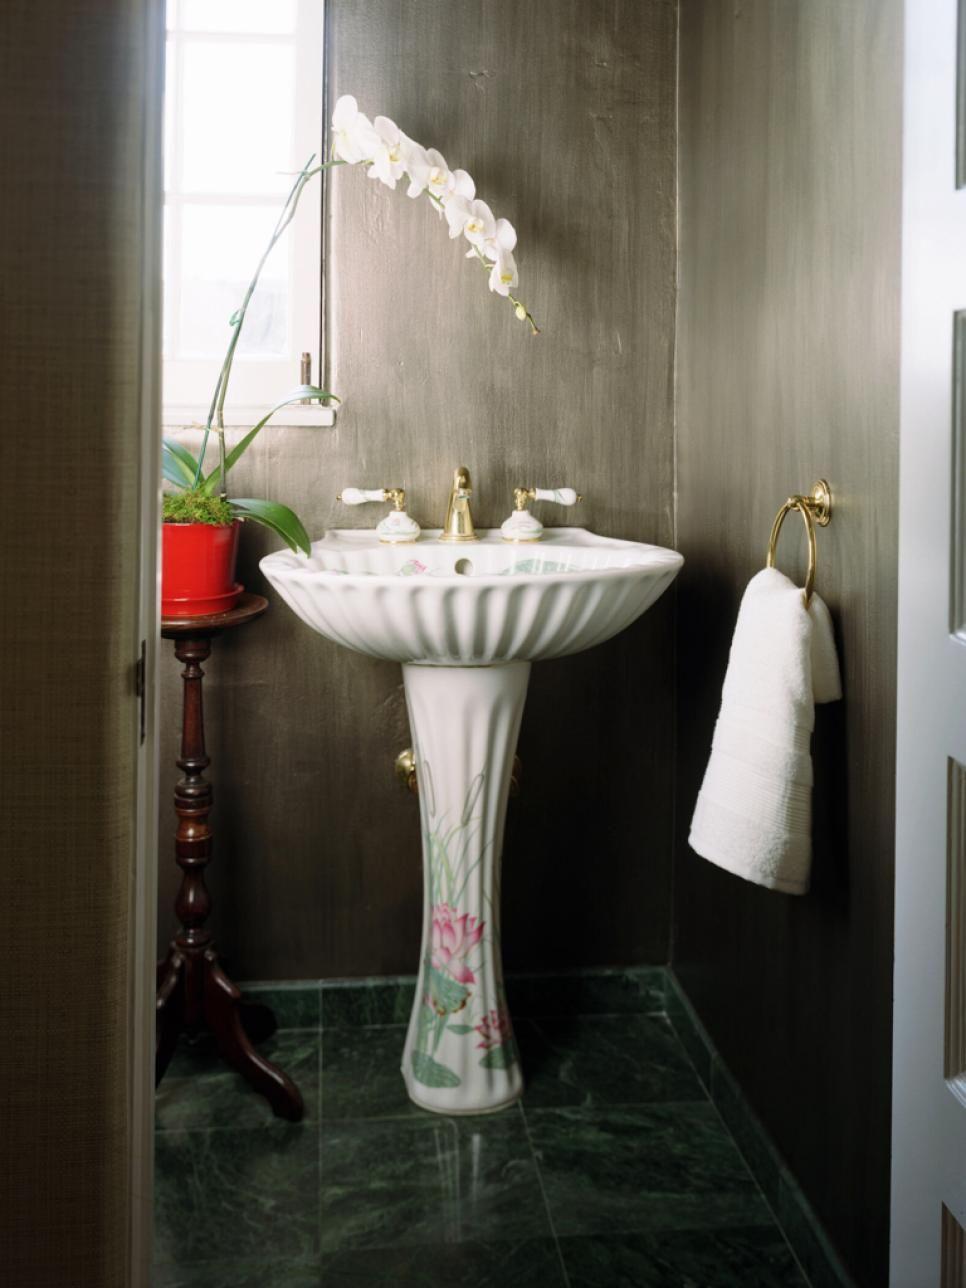 17 Clever Ideas For Small Baths  Half Baths Small Half Baths And Awesome Clever Small Bathroom Designs 2018